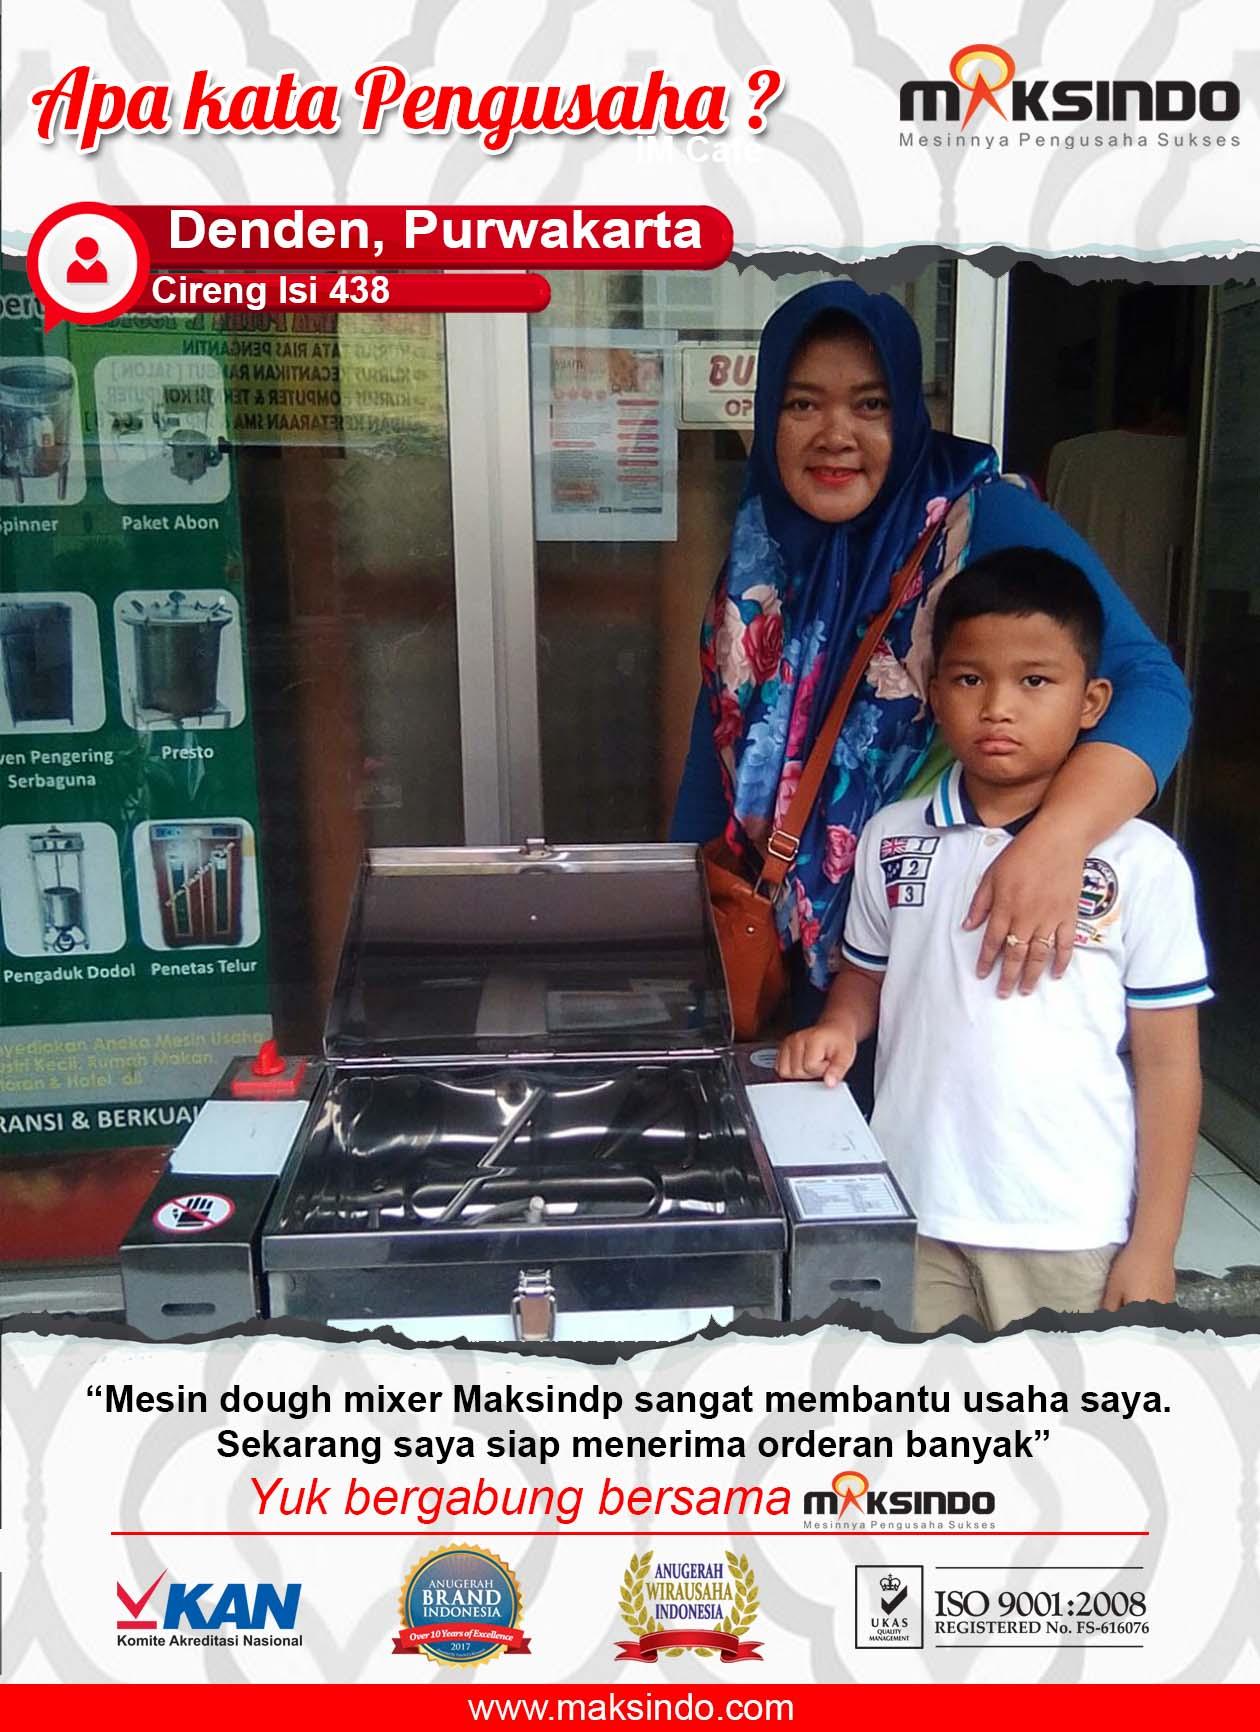 Cireng Isi 438 : Usaha Saya Jadi Semakin Terbantu dengan Mesin Dough Mixer dari Maksindo